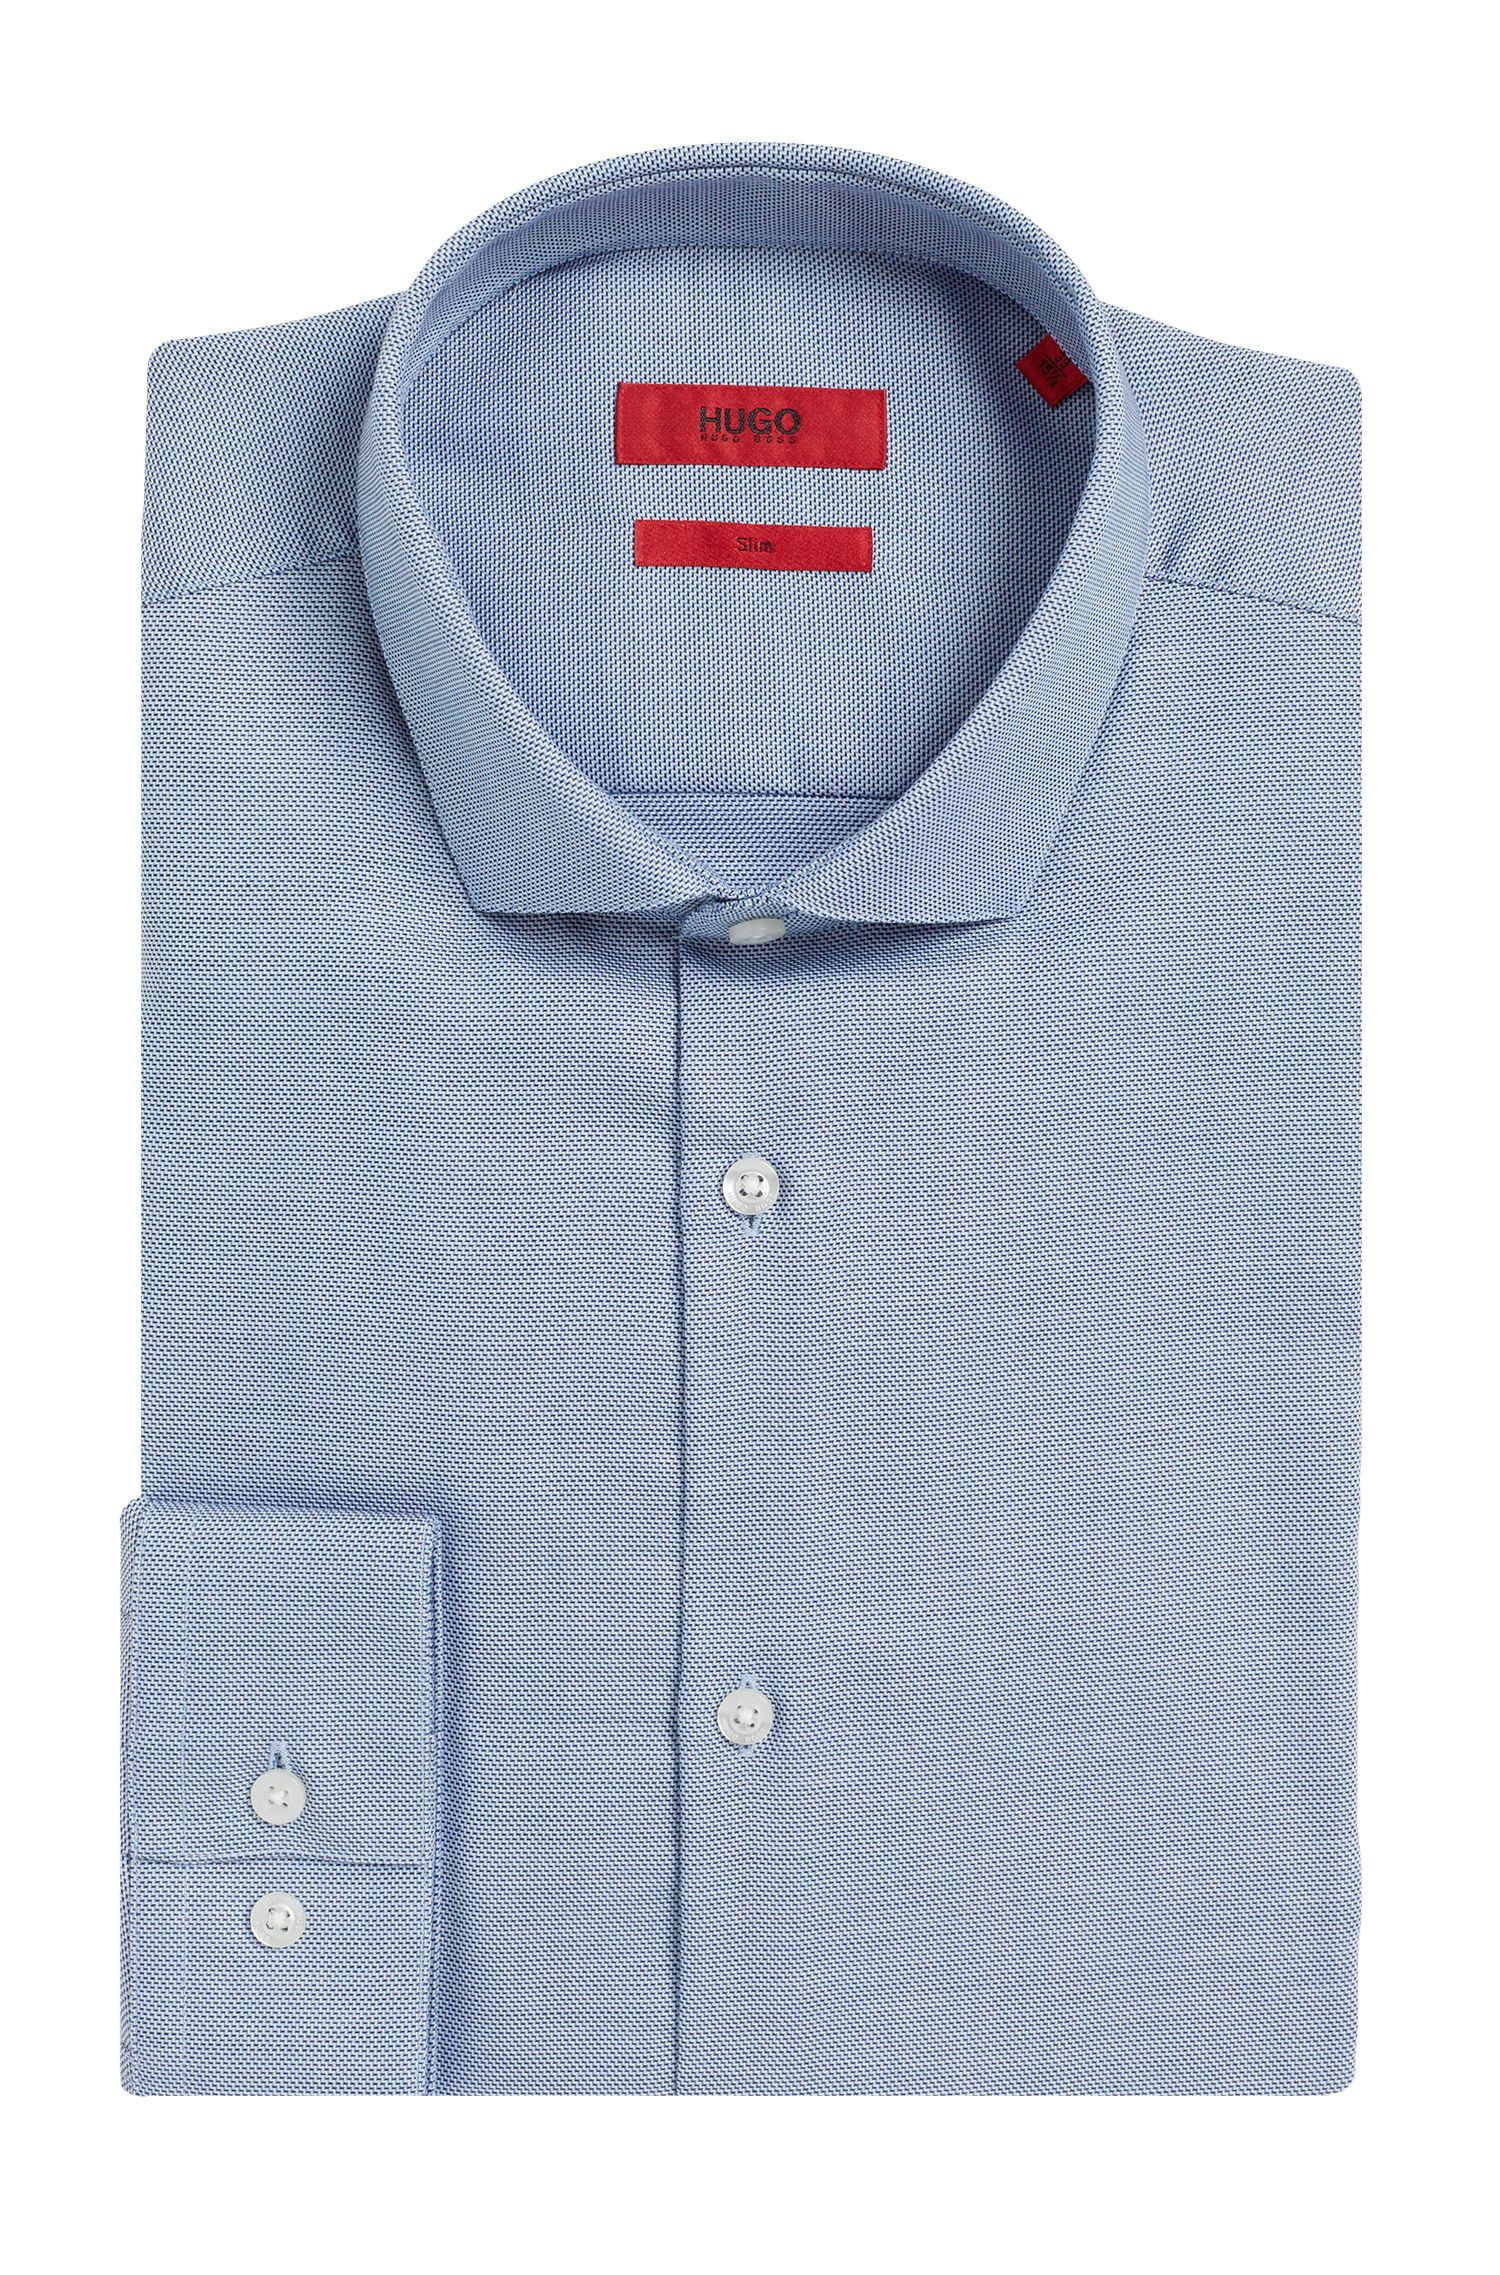 Fein gemustertes Slim-Fit Hemd aus Baumwolle: 'Erondo'